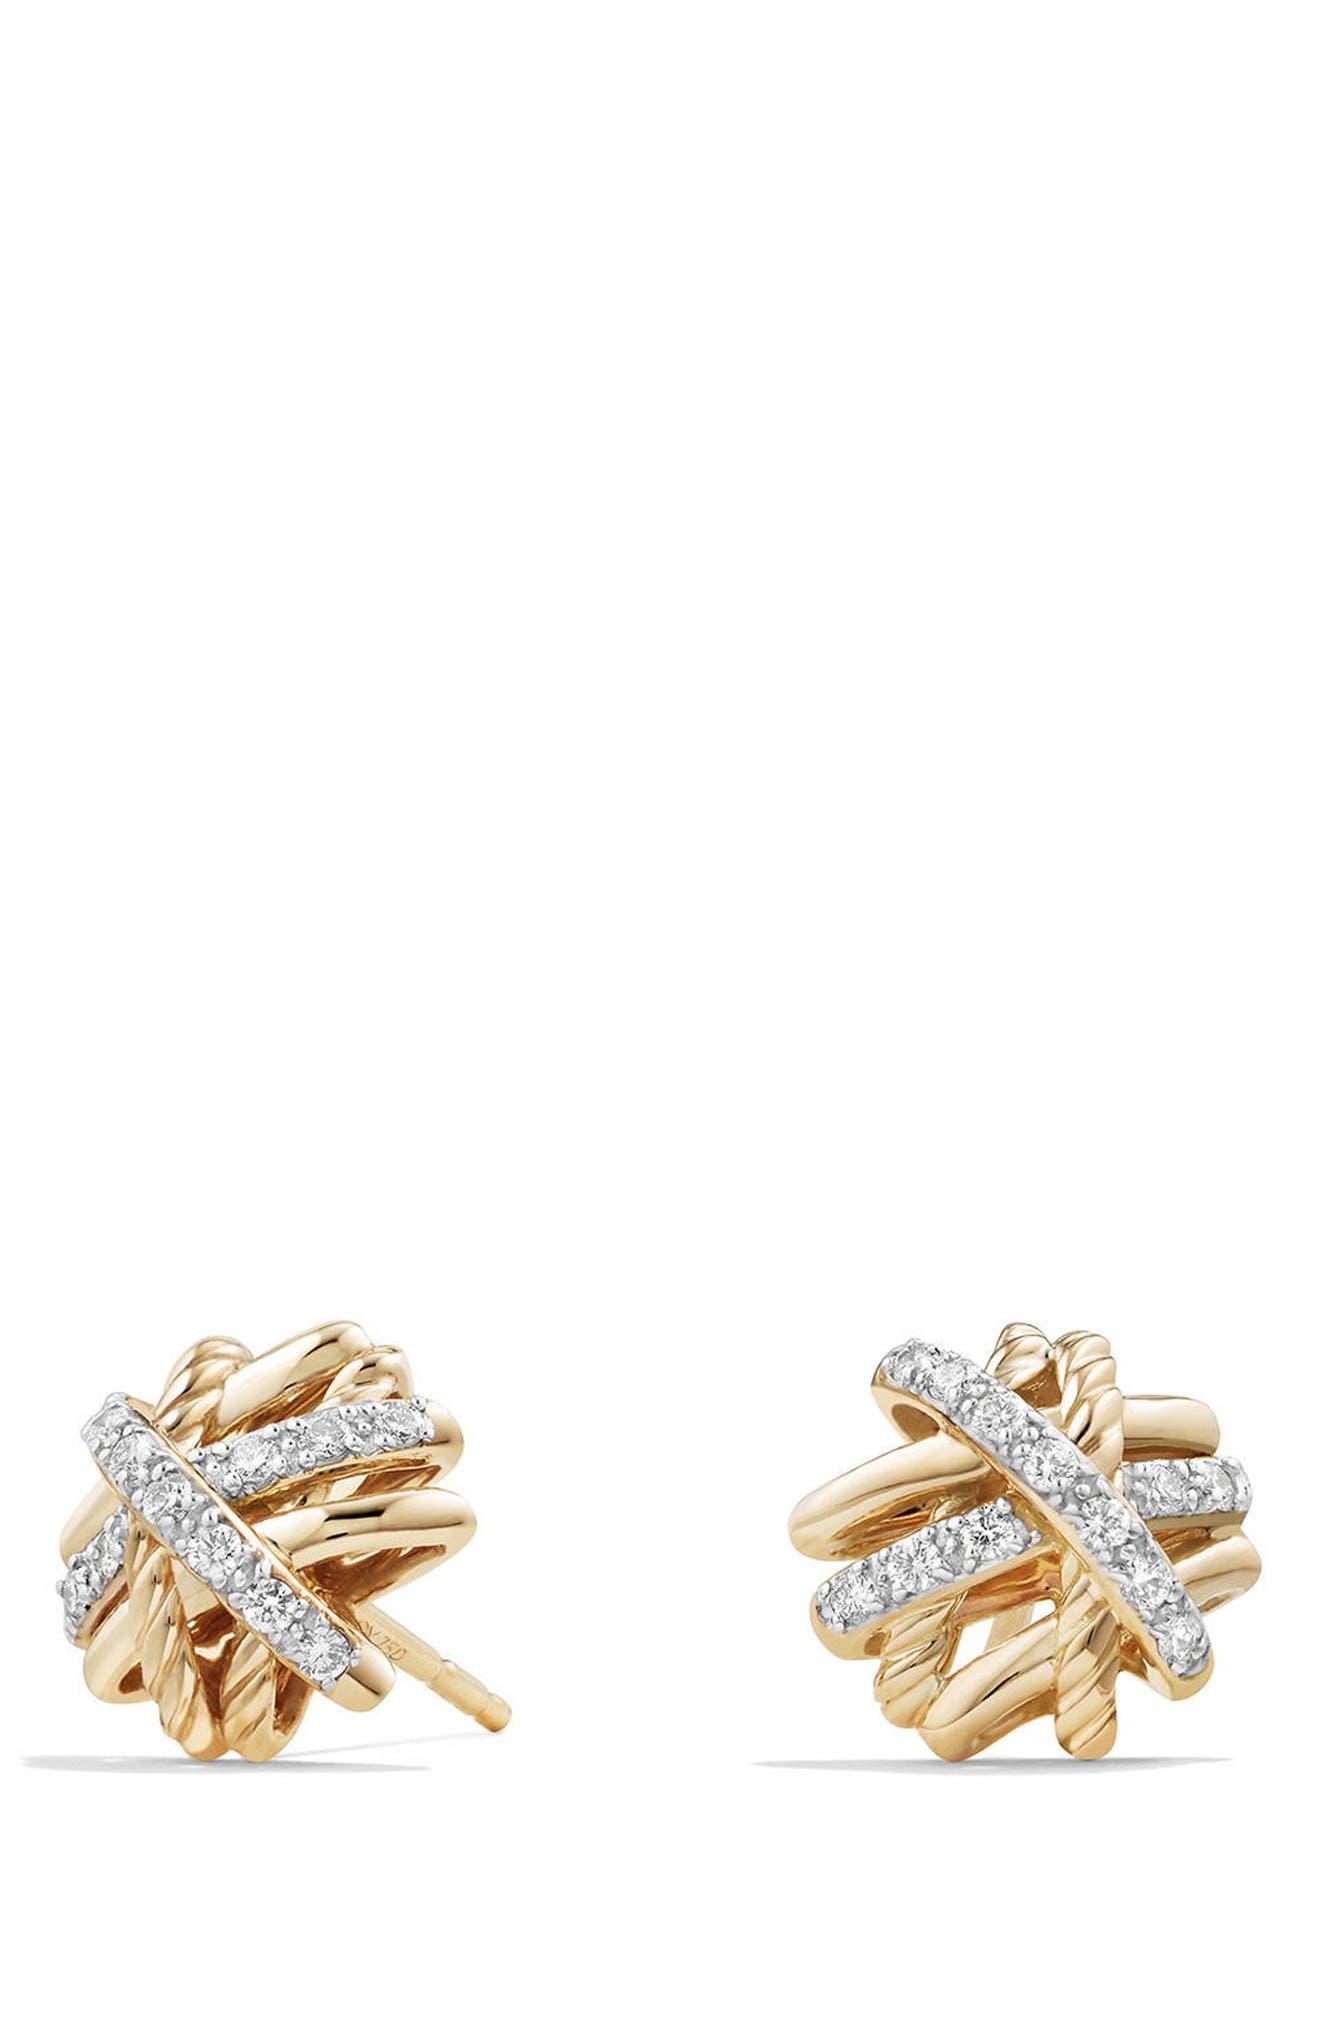 DAVID YURMAN, Crossover Stud Earrings with Diamonds in 18k Gold, Main thumbnail 1, color, YELLOW GOLD/ DIAMOND